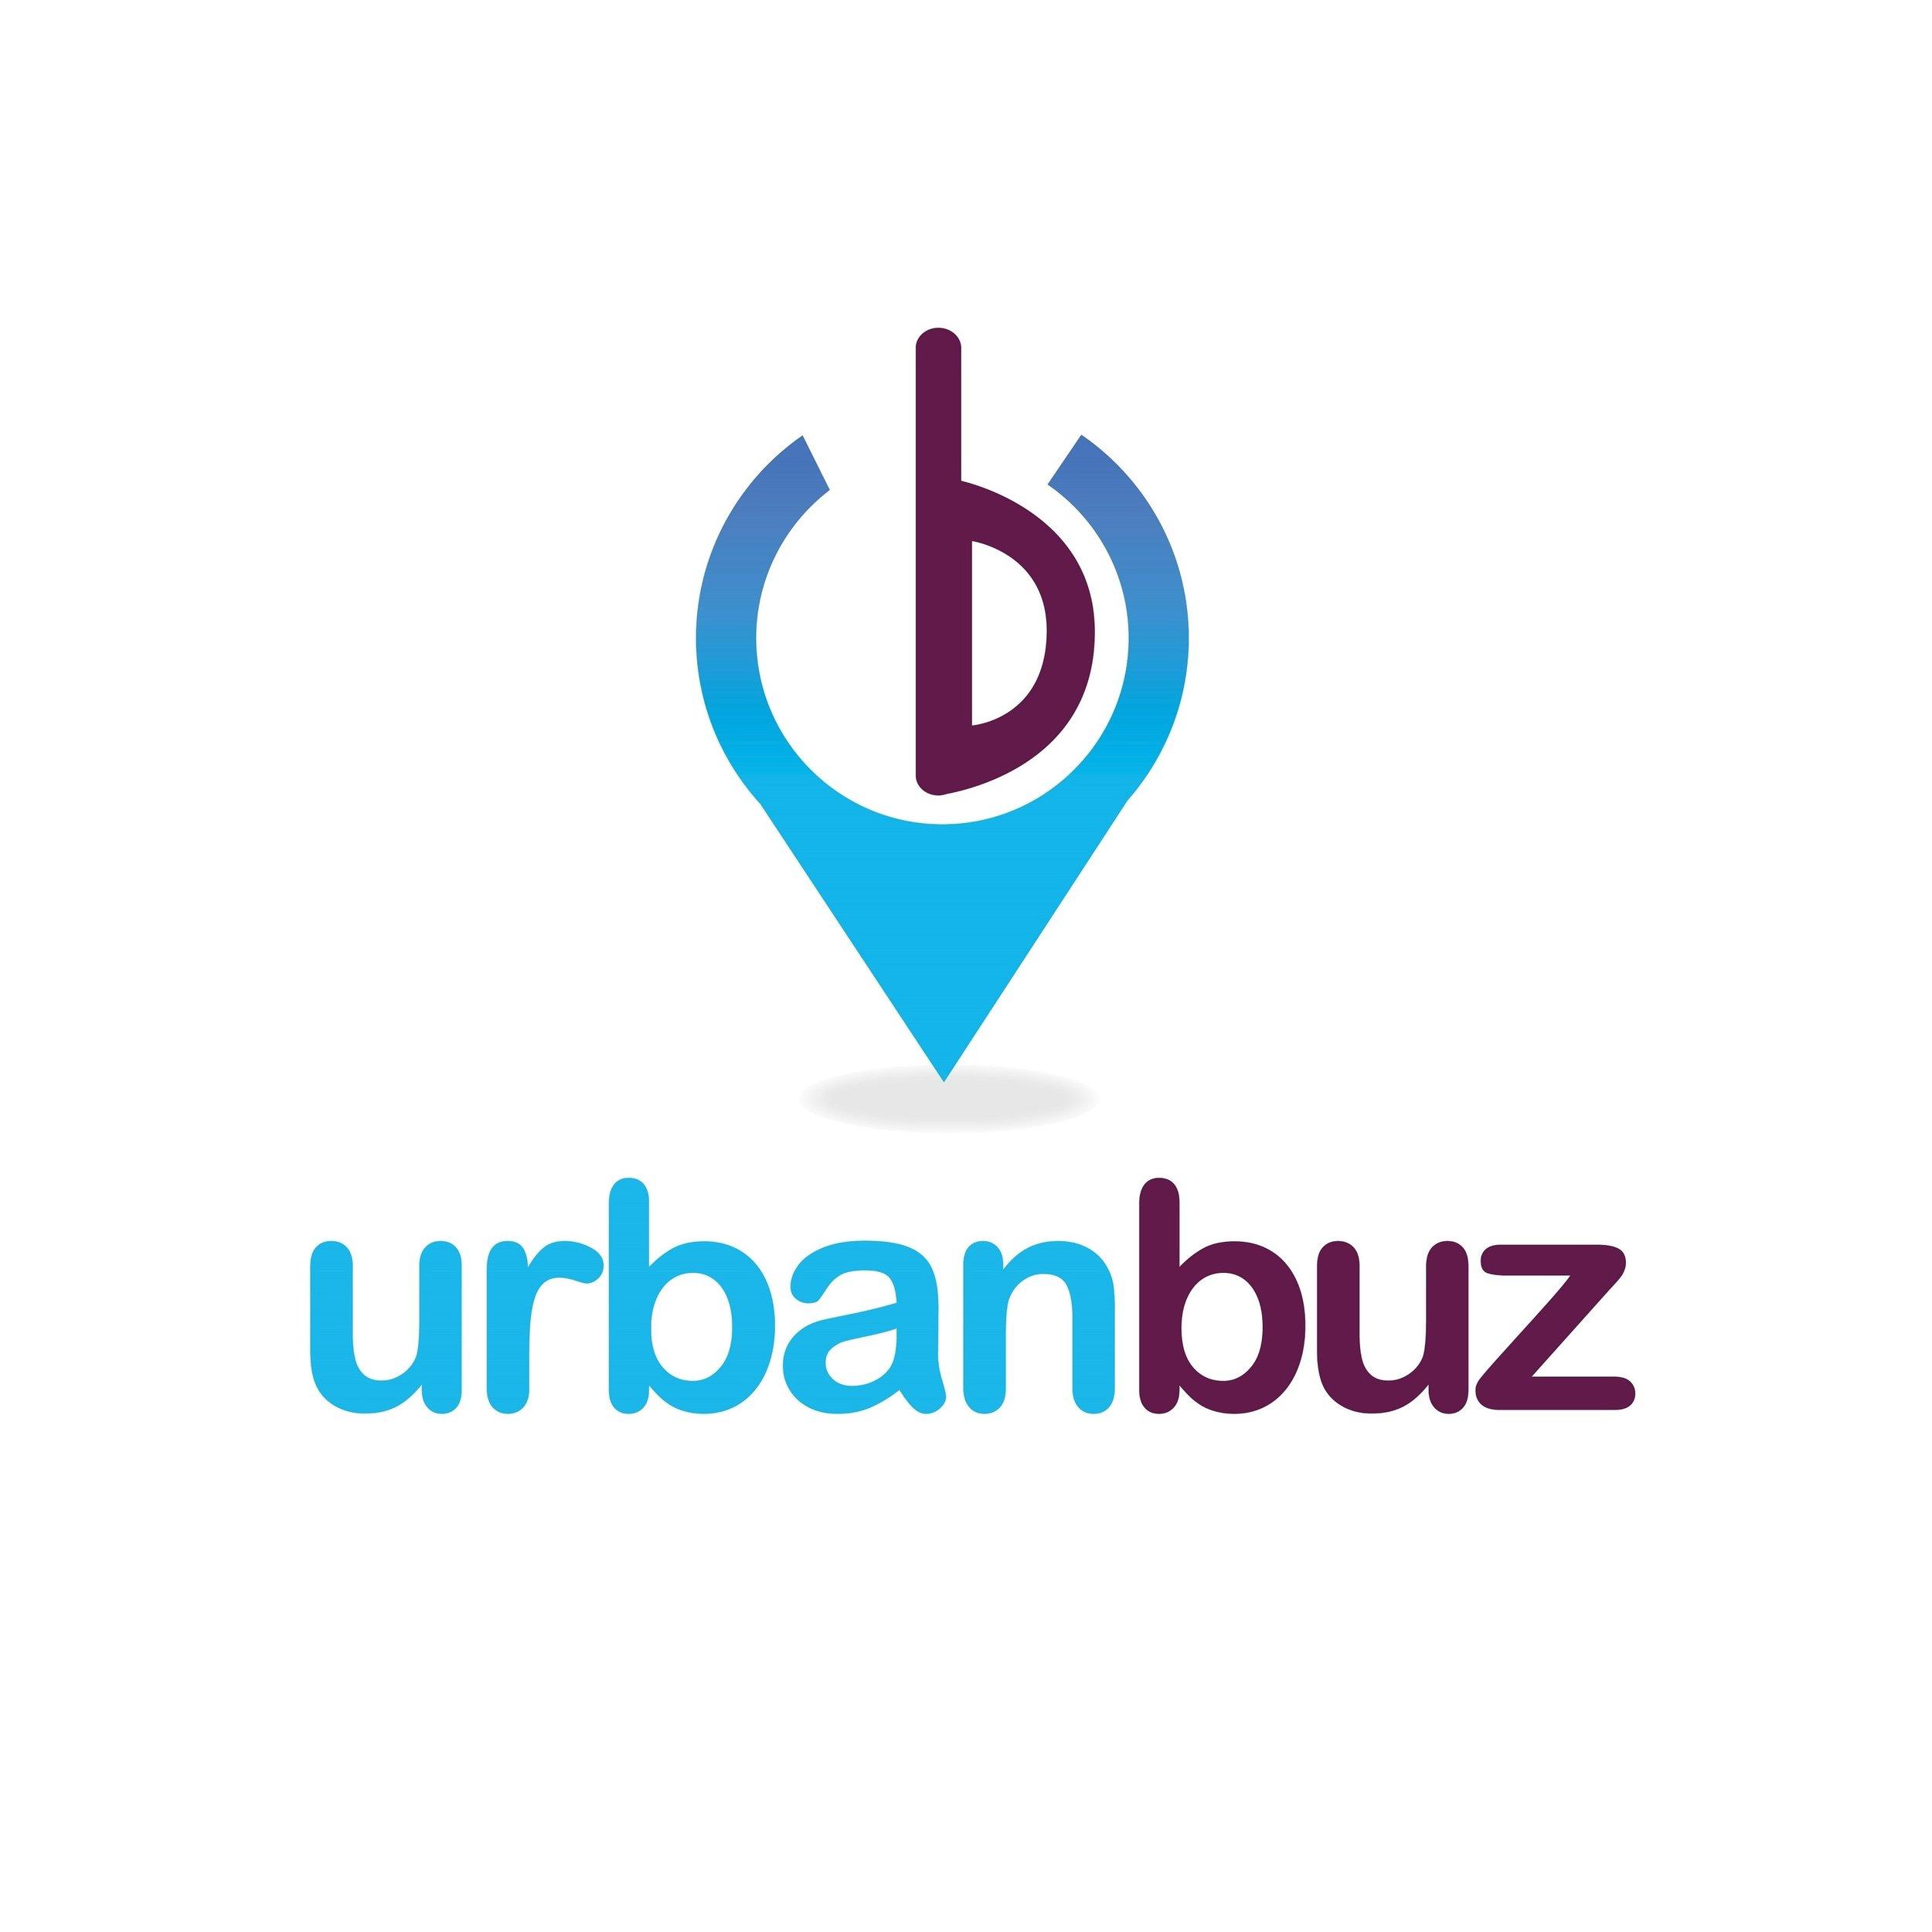 UrbanBuz.jpg